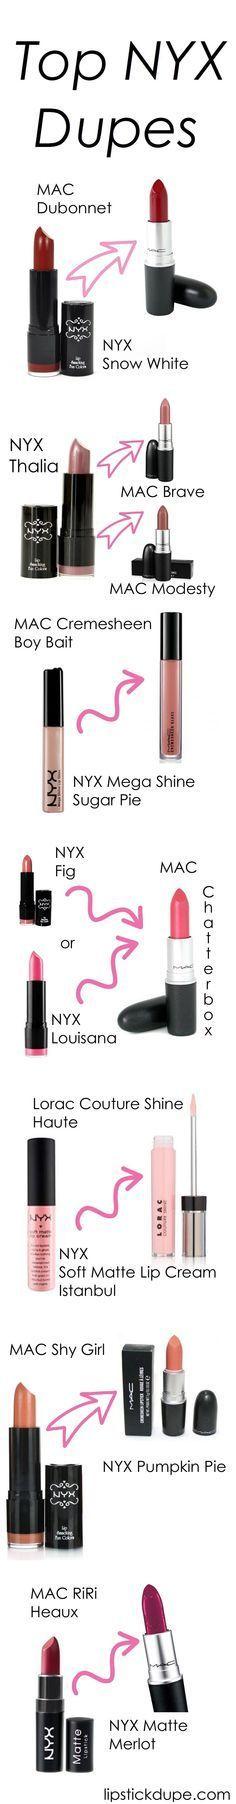 Dupe MAC lipstick